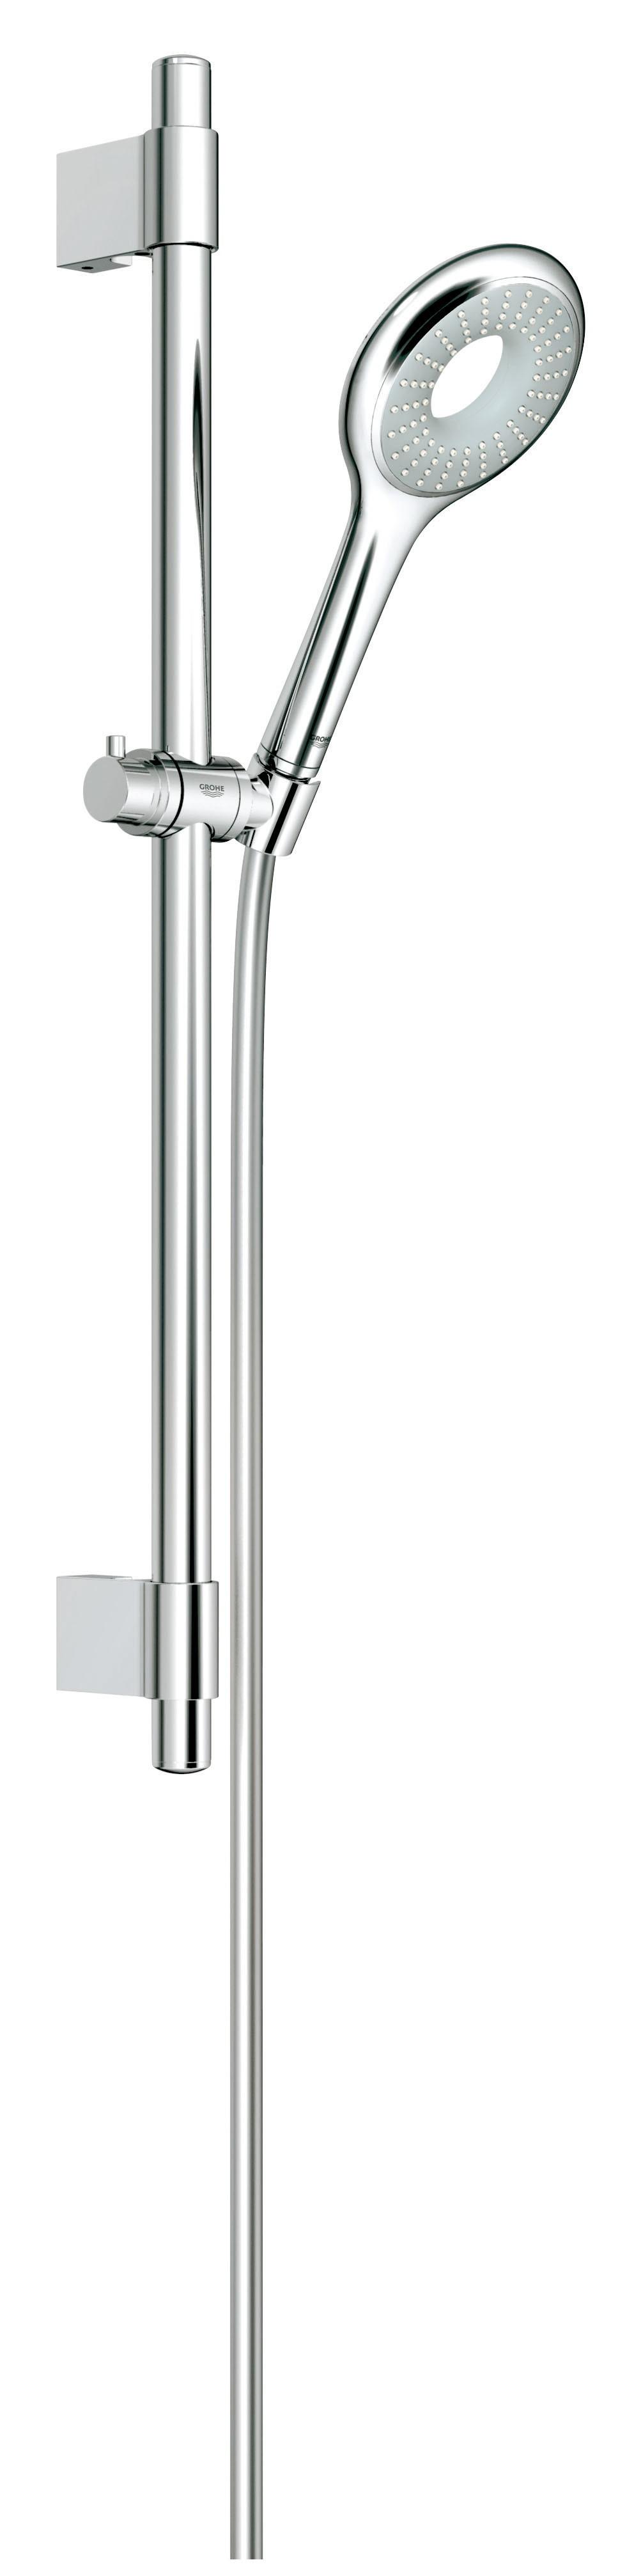 Душевой гарнитур Grohe 27529000 Rainshower Icon 100 (ручной душ, штанга 600 мм, шланг 1750 мм), хром